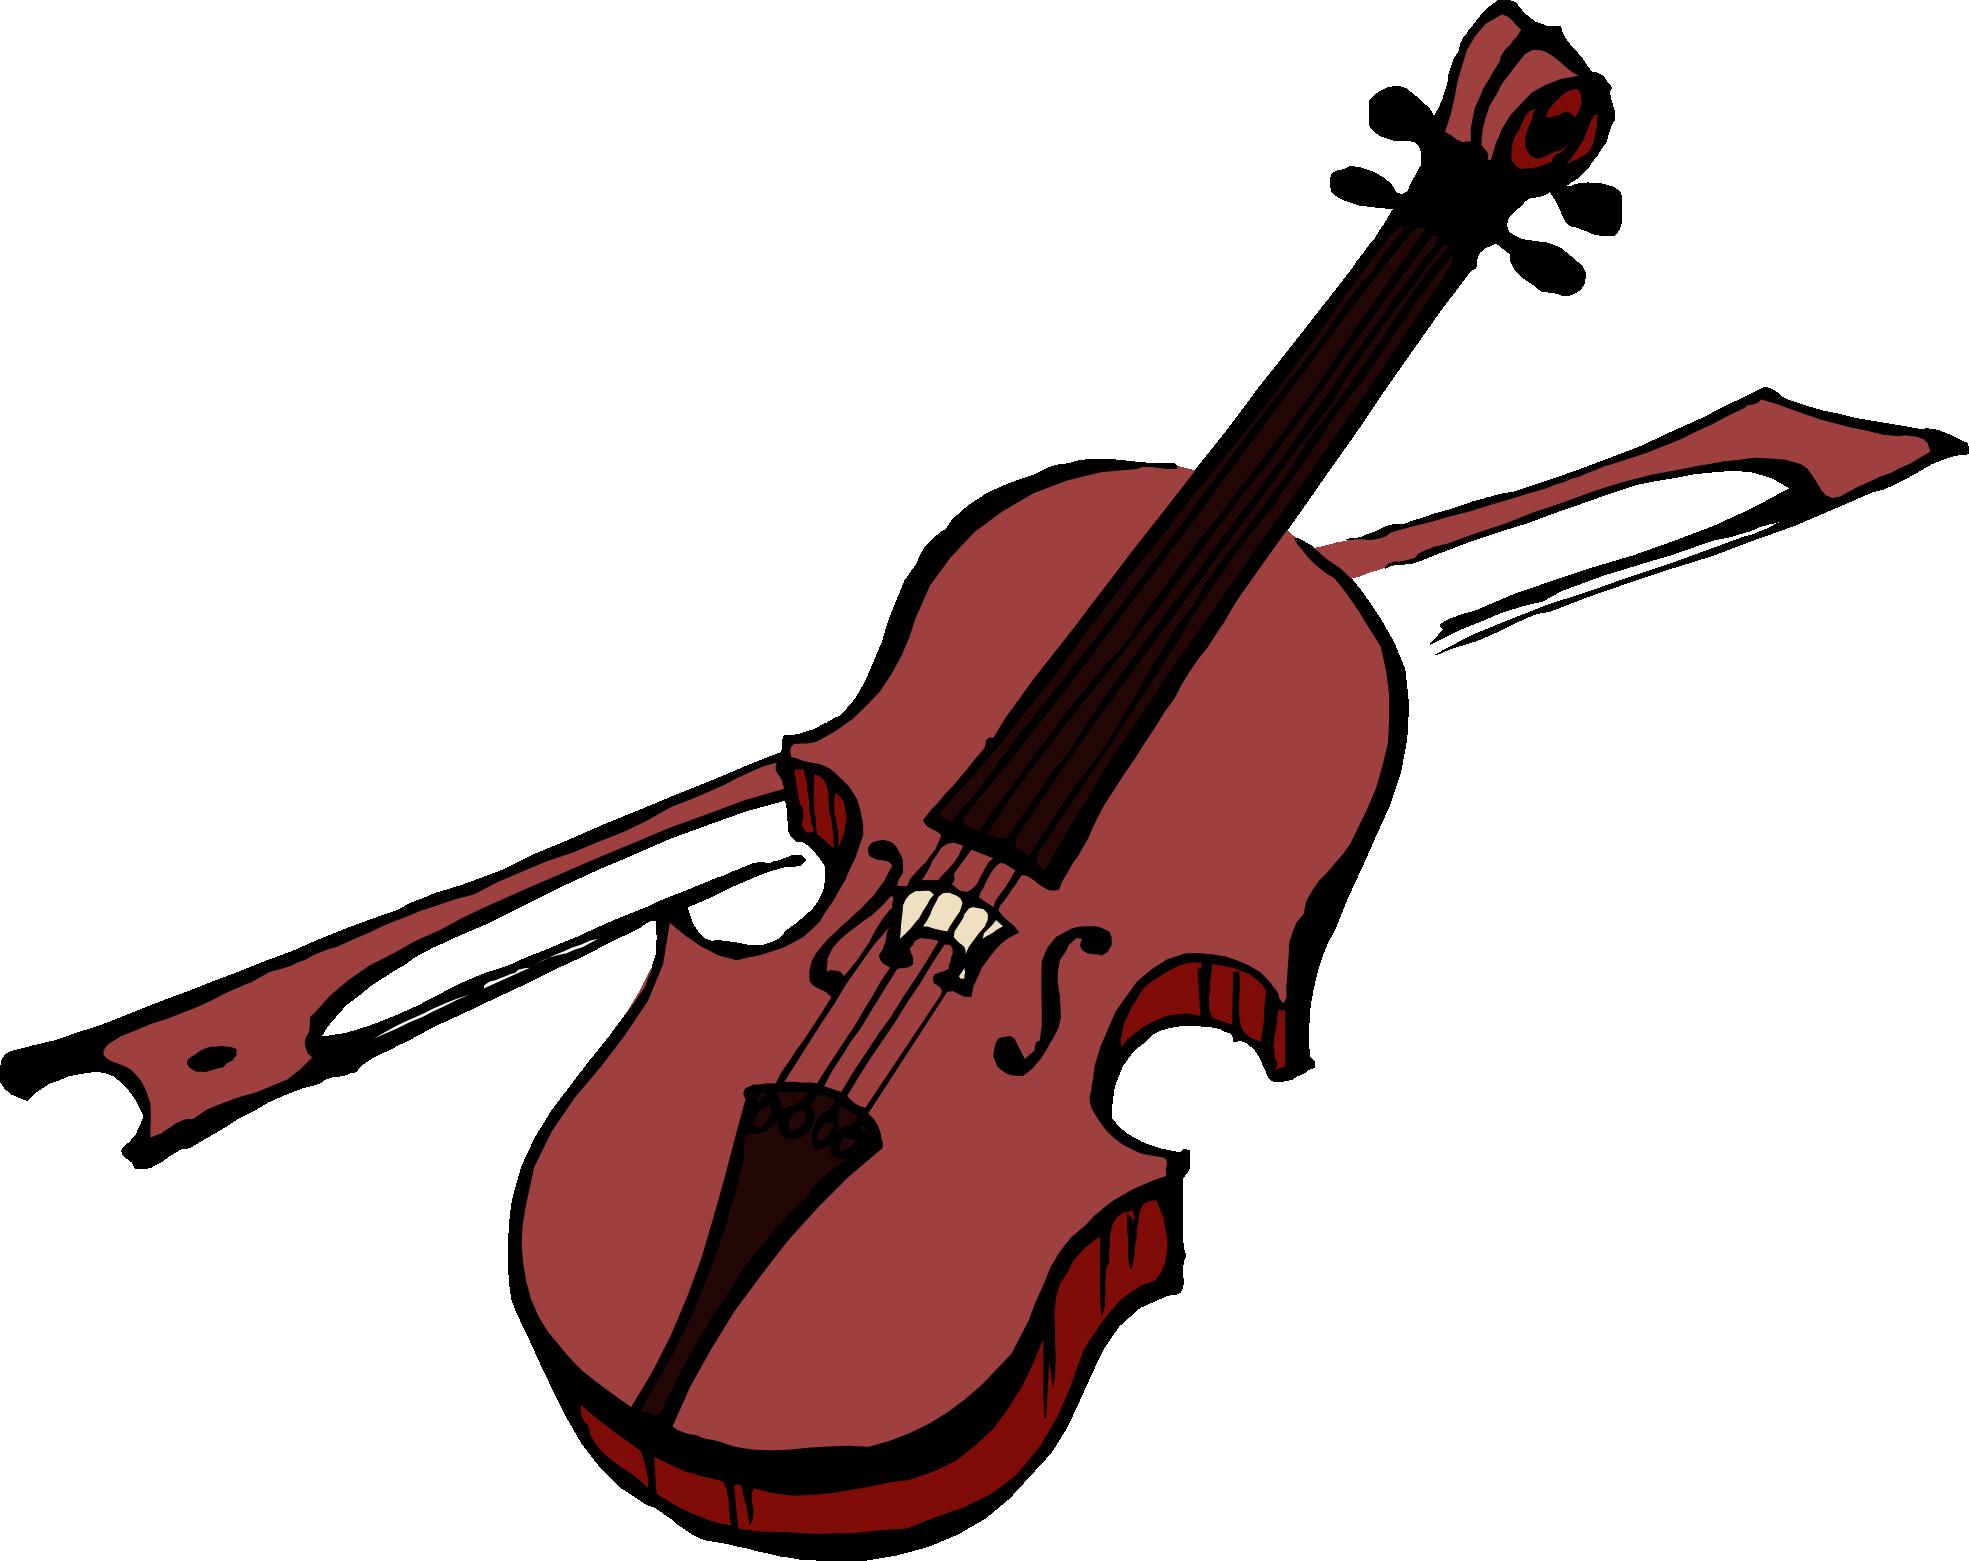 Violin clip art images free clipart 2